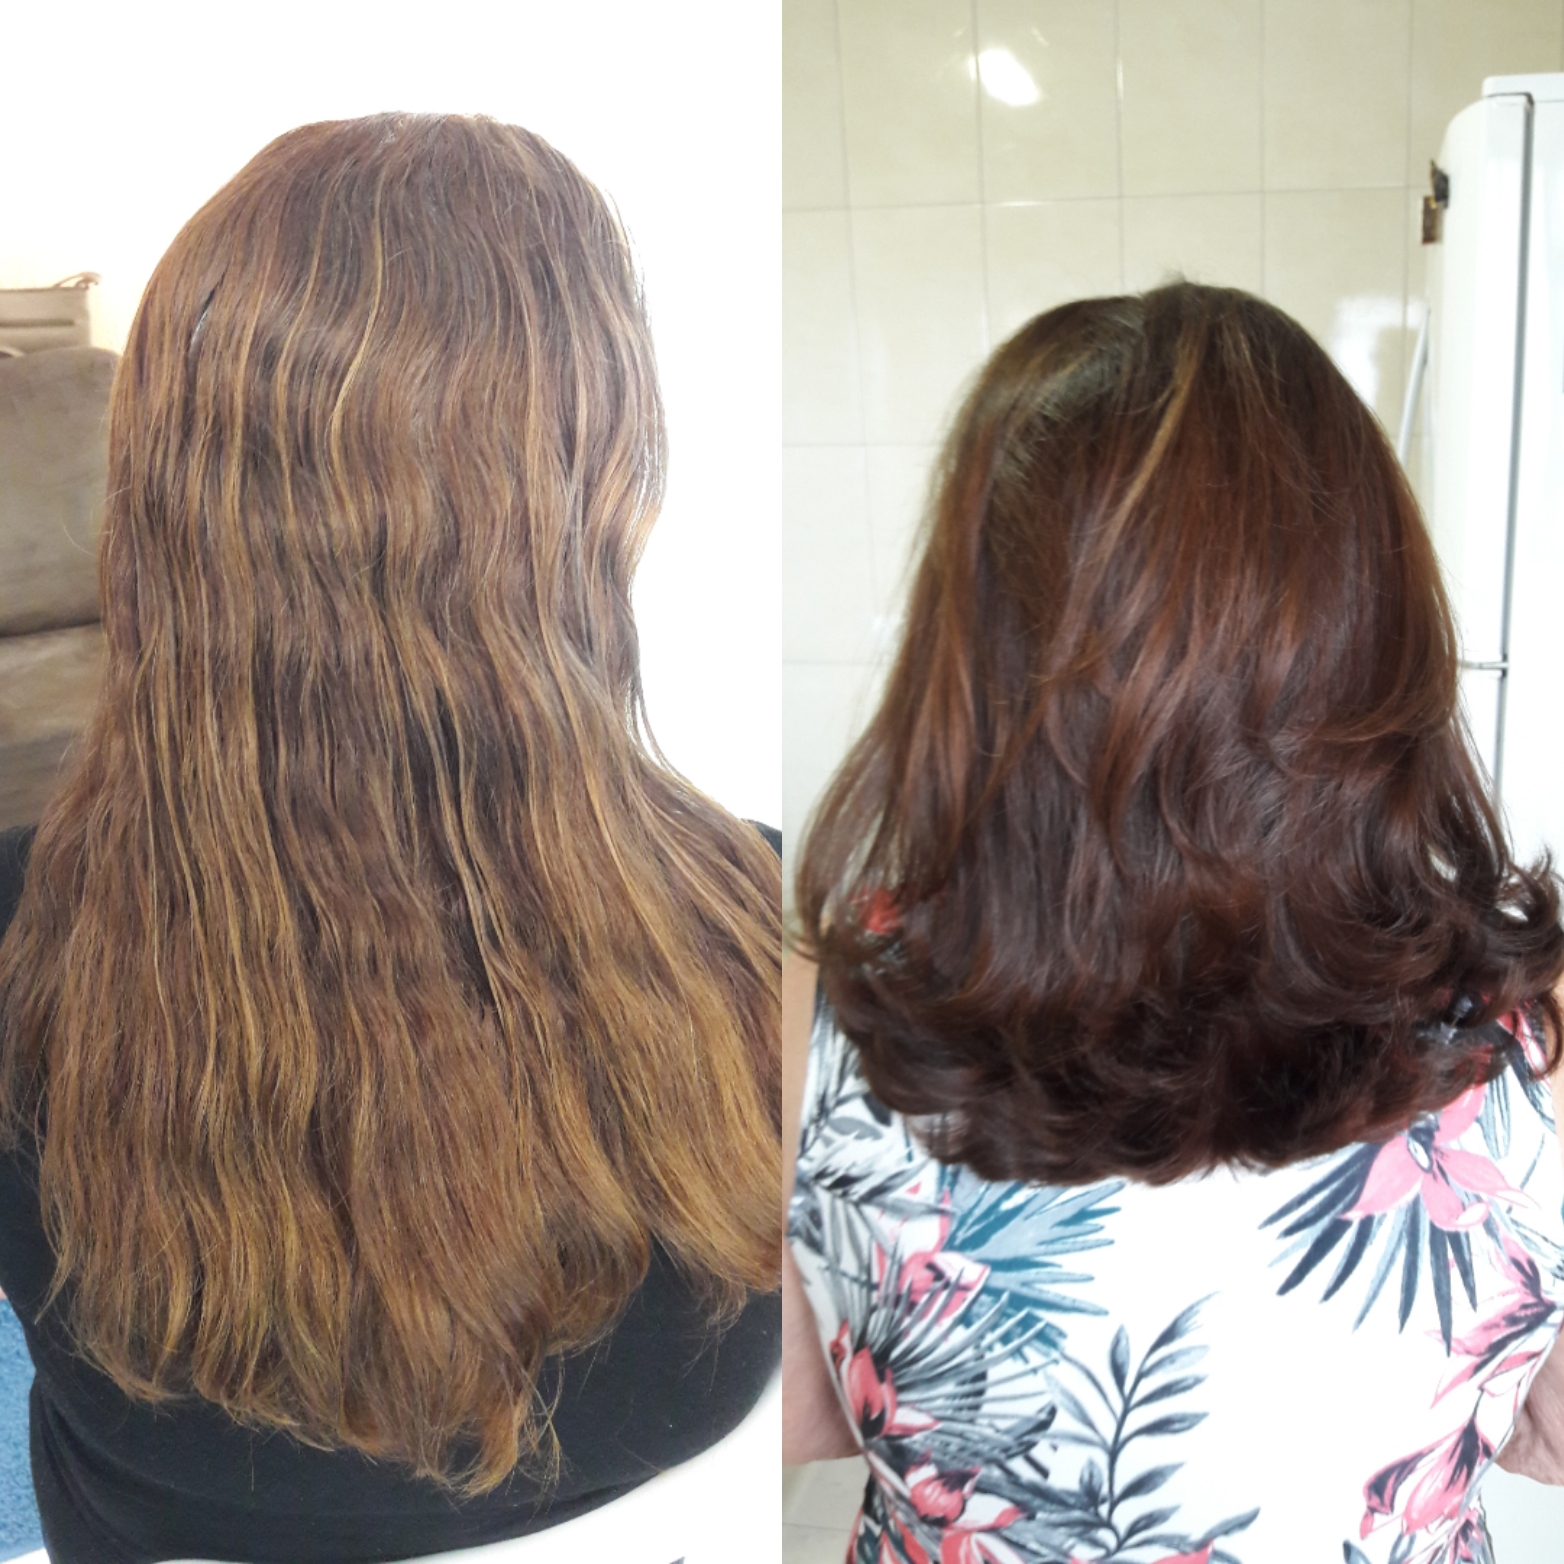 Corte e Correção da cor. #cortedegrade #hairstyst  #hairdresser #cabelereiro #amor     auxiliar cabeleireiro(a) auxiliar cabeleireiro(a) auxiliar cabeleireiro(a)